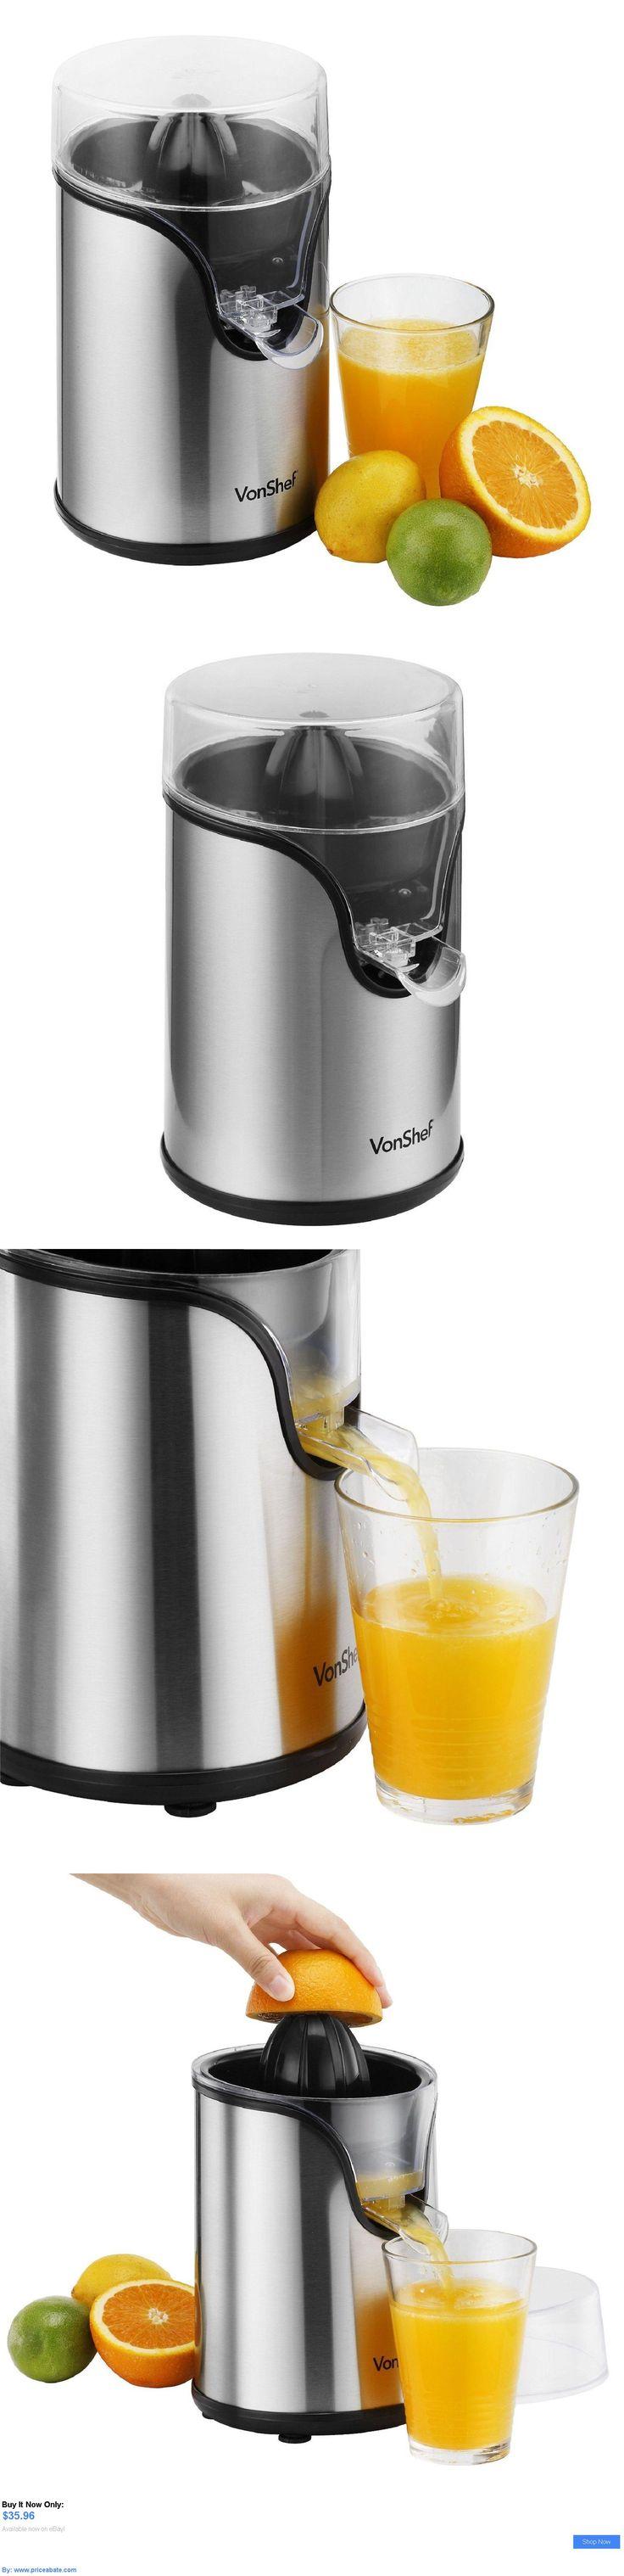 Uncategorized Where To Buy Small Kitchen Appliances best 20 orange juice machine ideas on pinterest small kitchen appliances electric citrus juicer fruit extractor attachments squeezer buy it